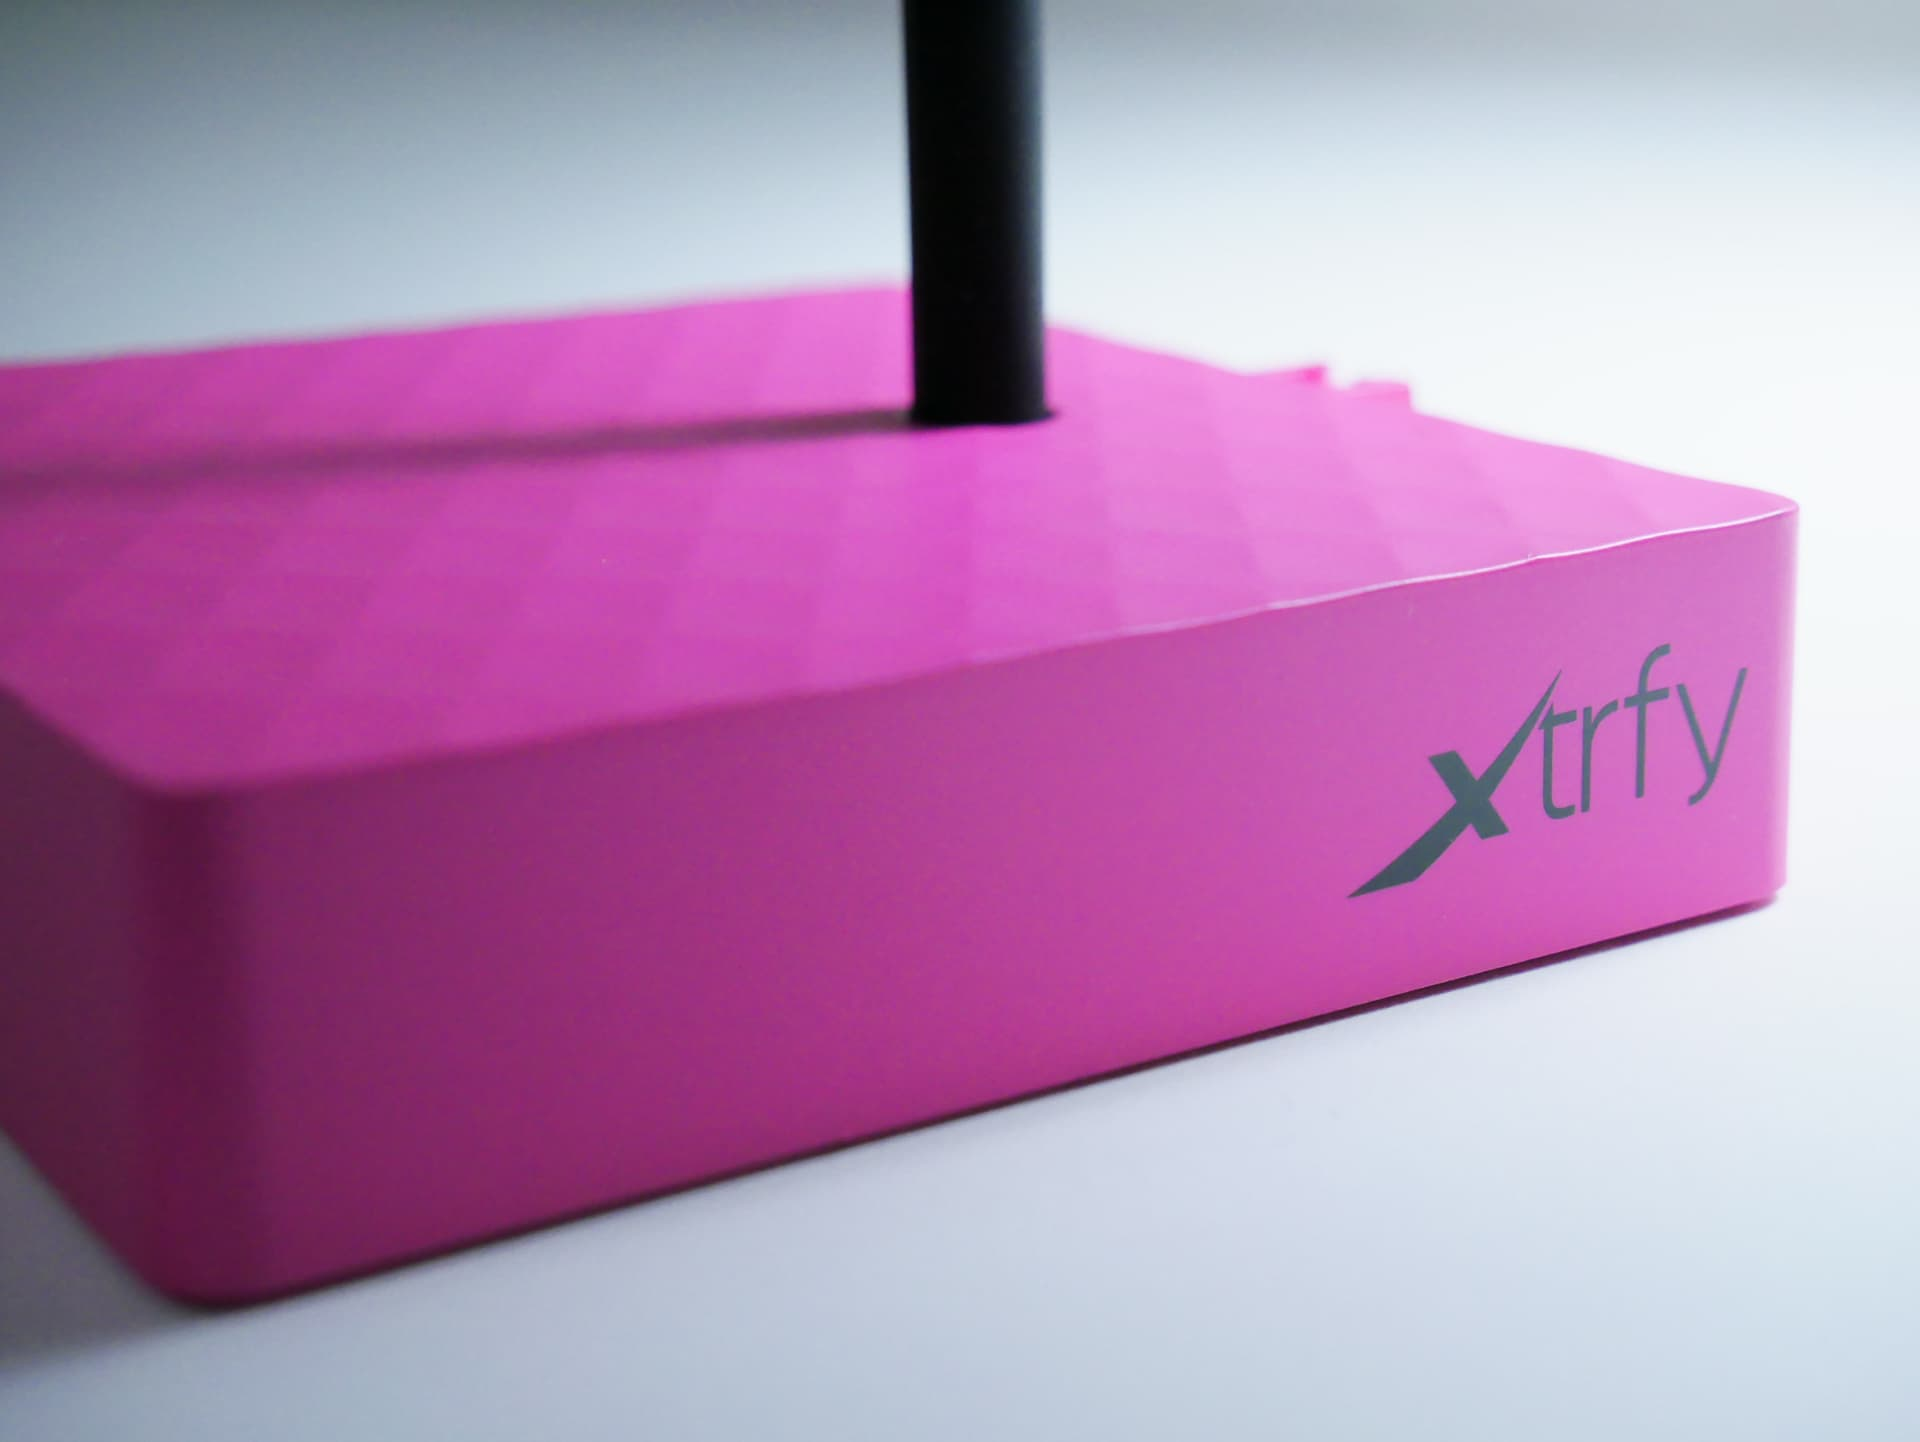 「Xtrfy B4」レビュー